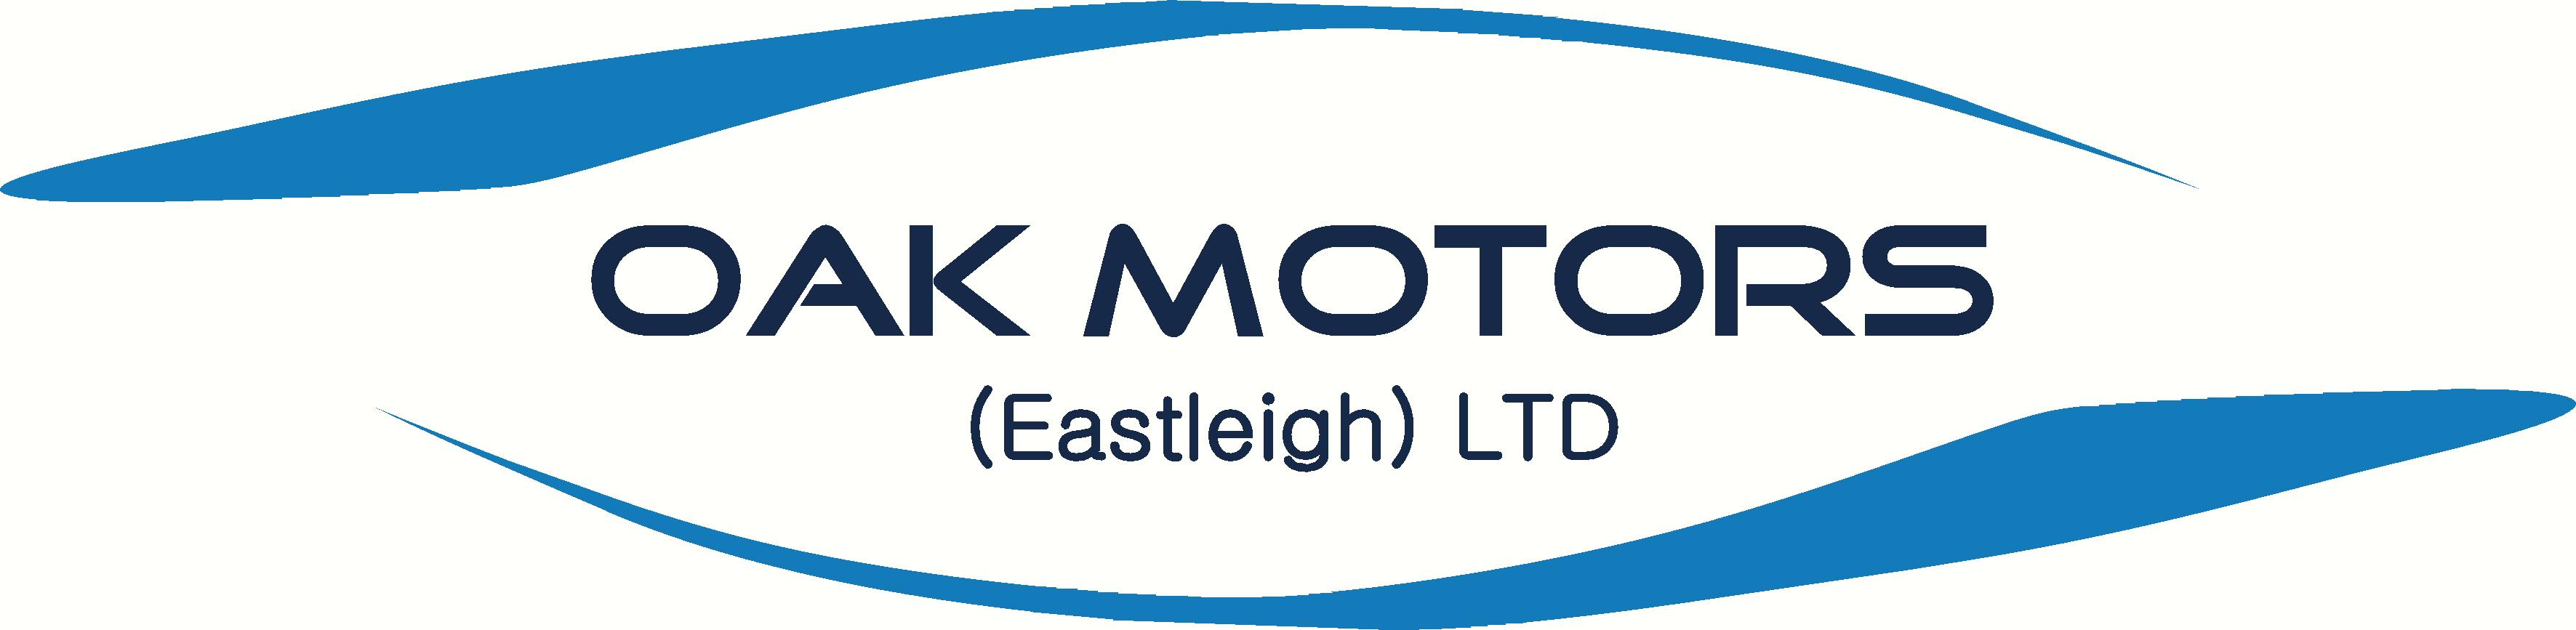 Oak Motors (Eastleigh) Ltd